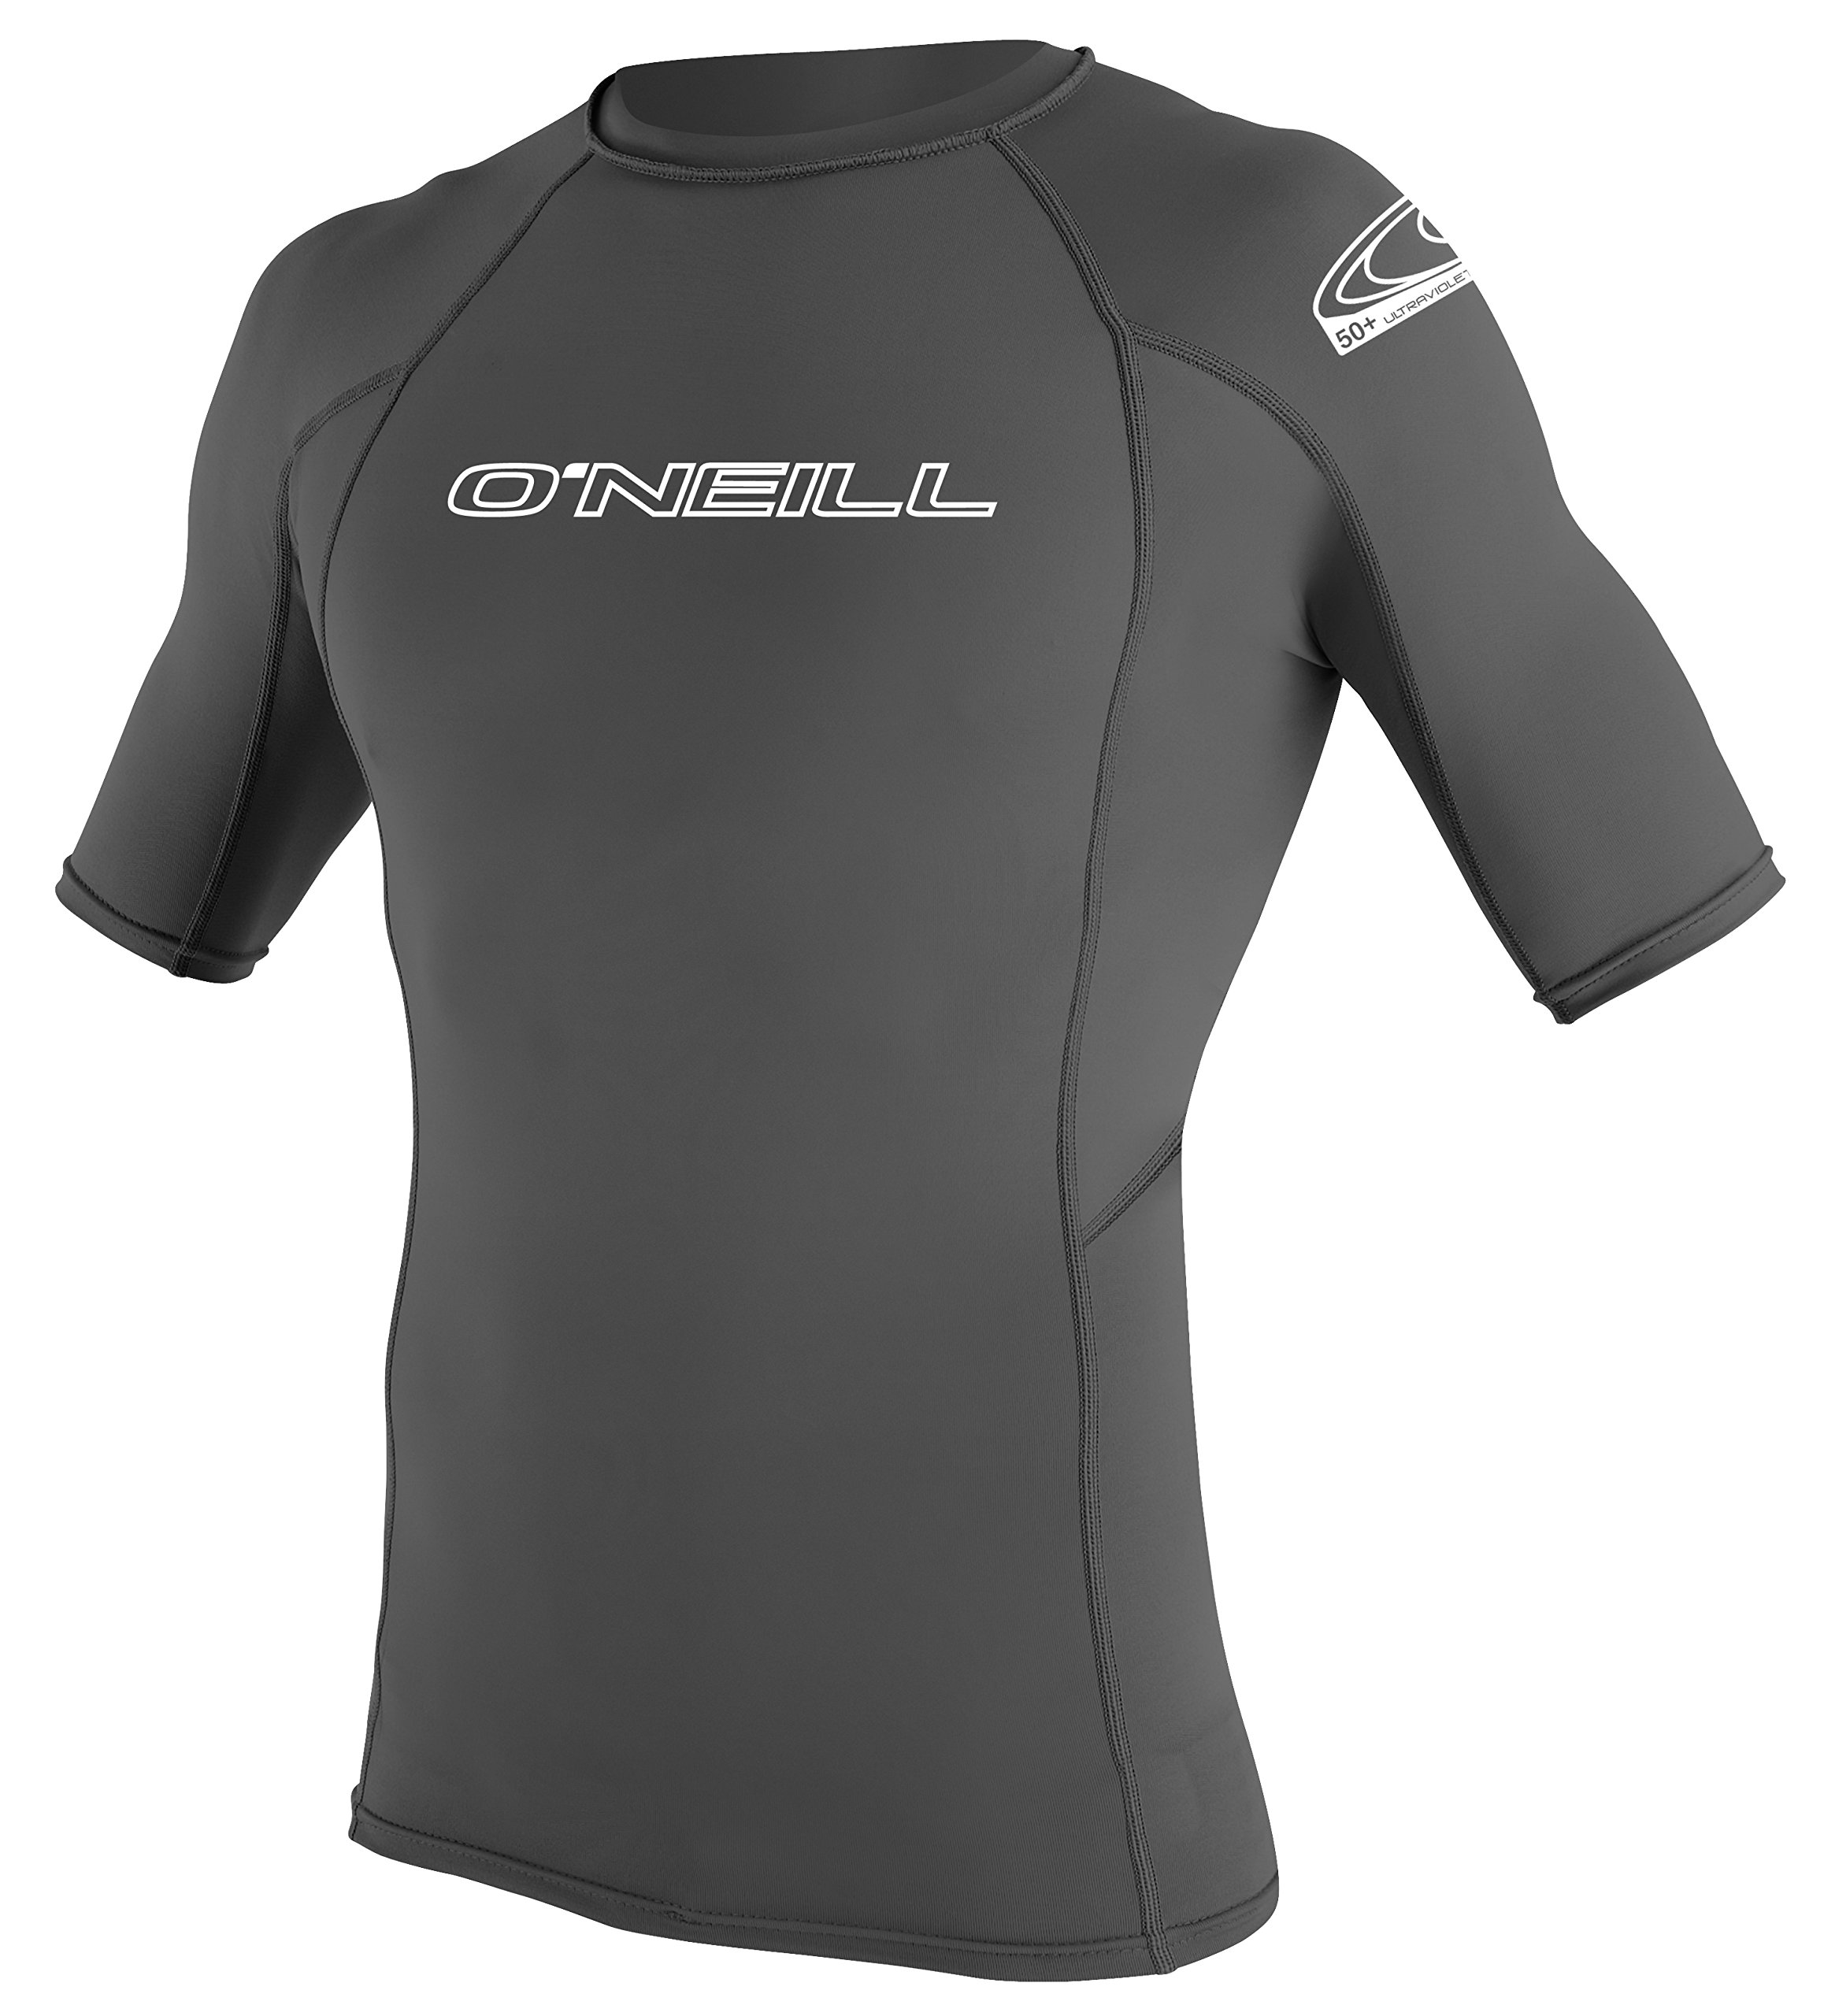 O'Neill Wetsuits Men's Basic Skins UPF 50+ Short Sleeve Rash Guard, Graphite, Small